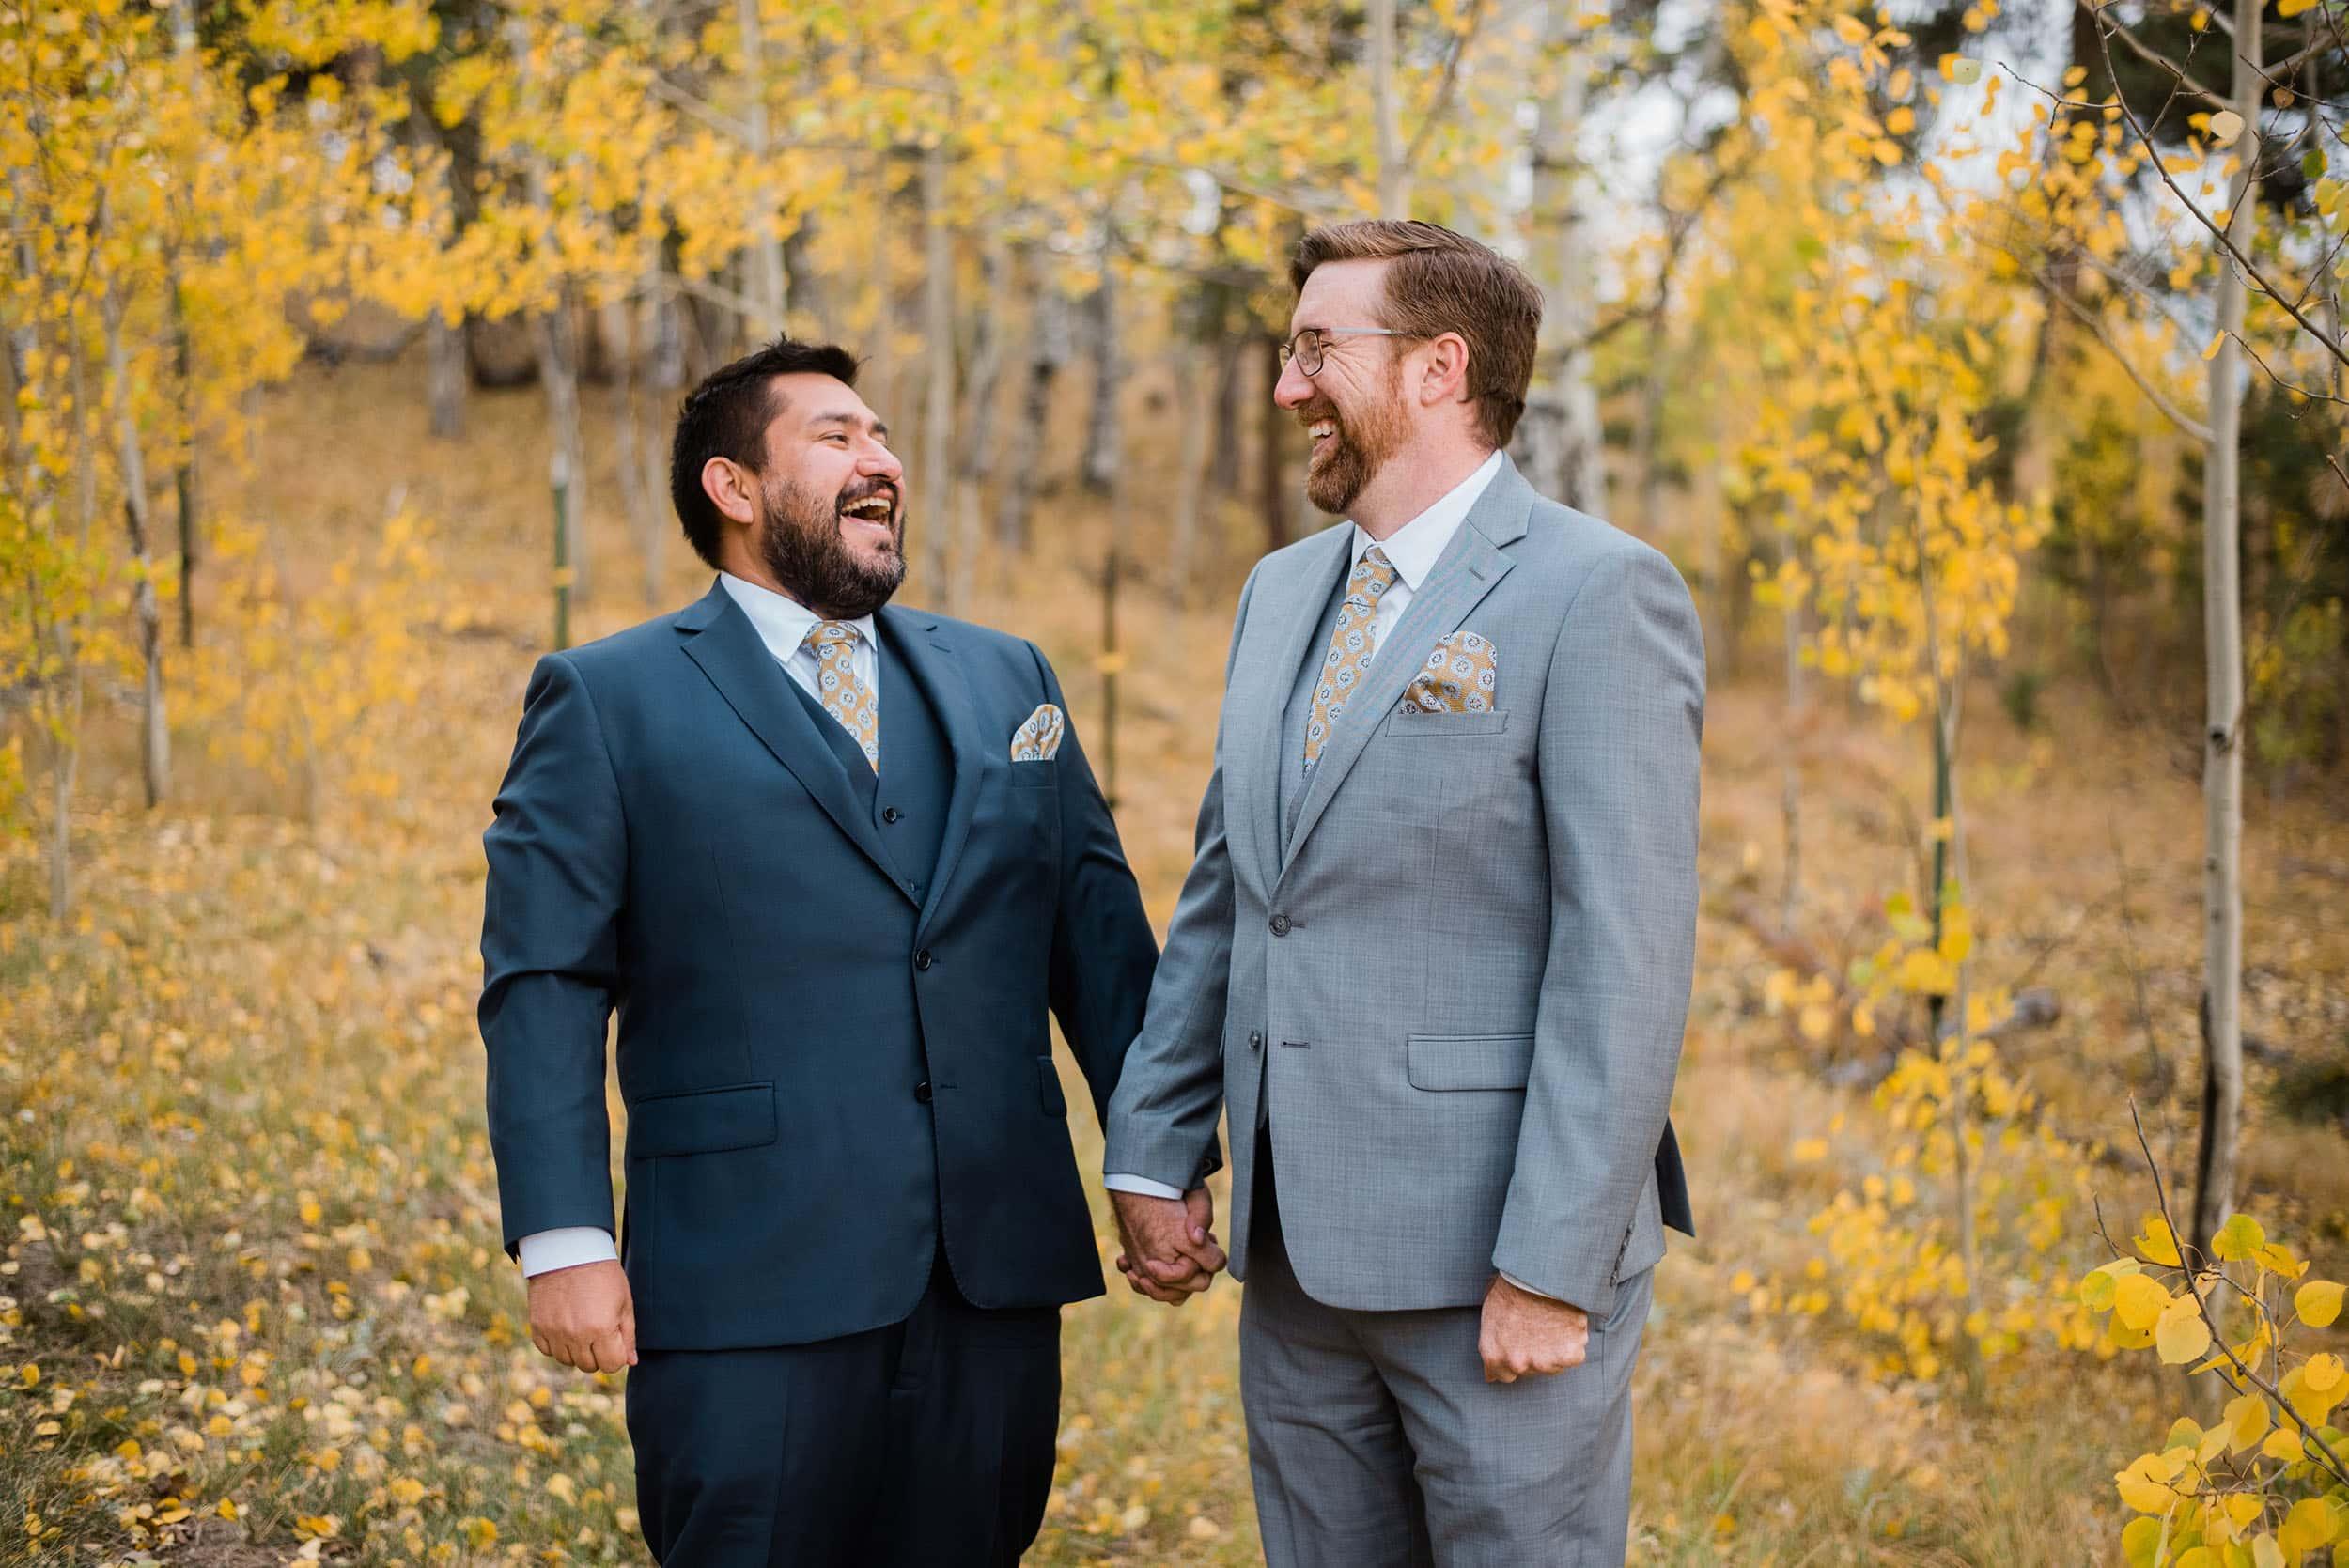 Gay Wedding Planning Resources